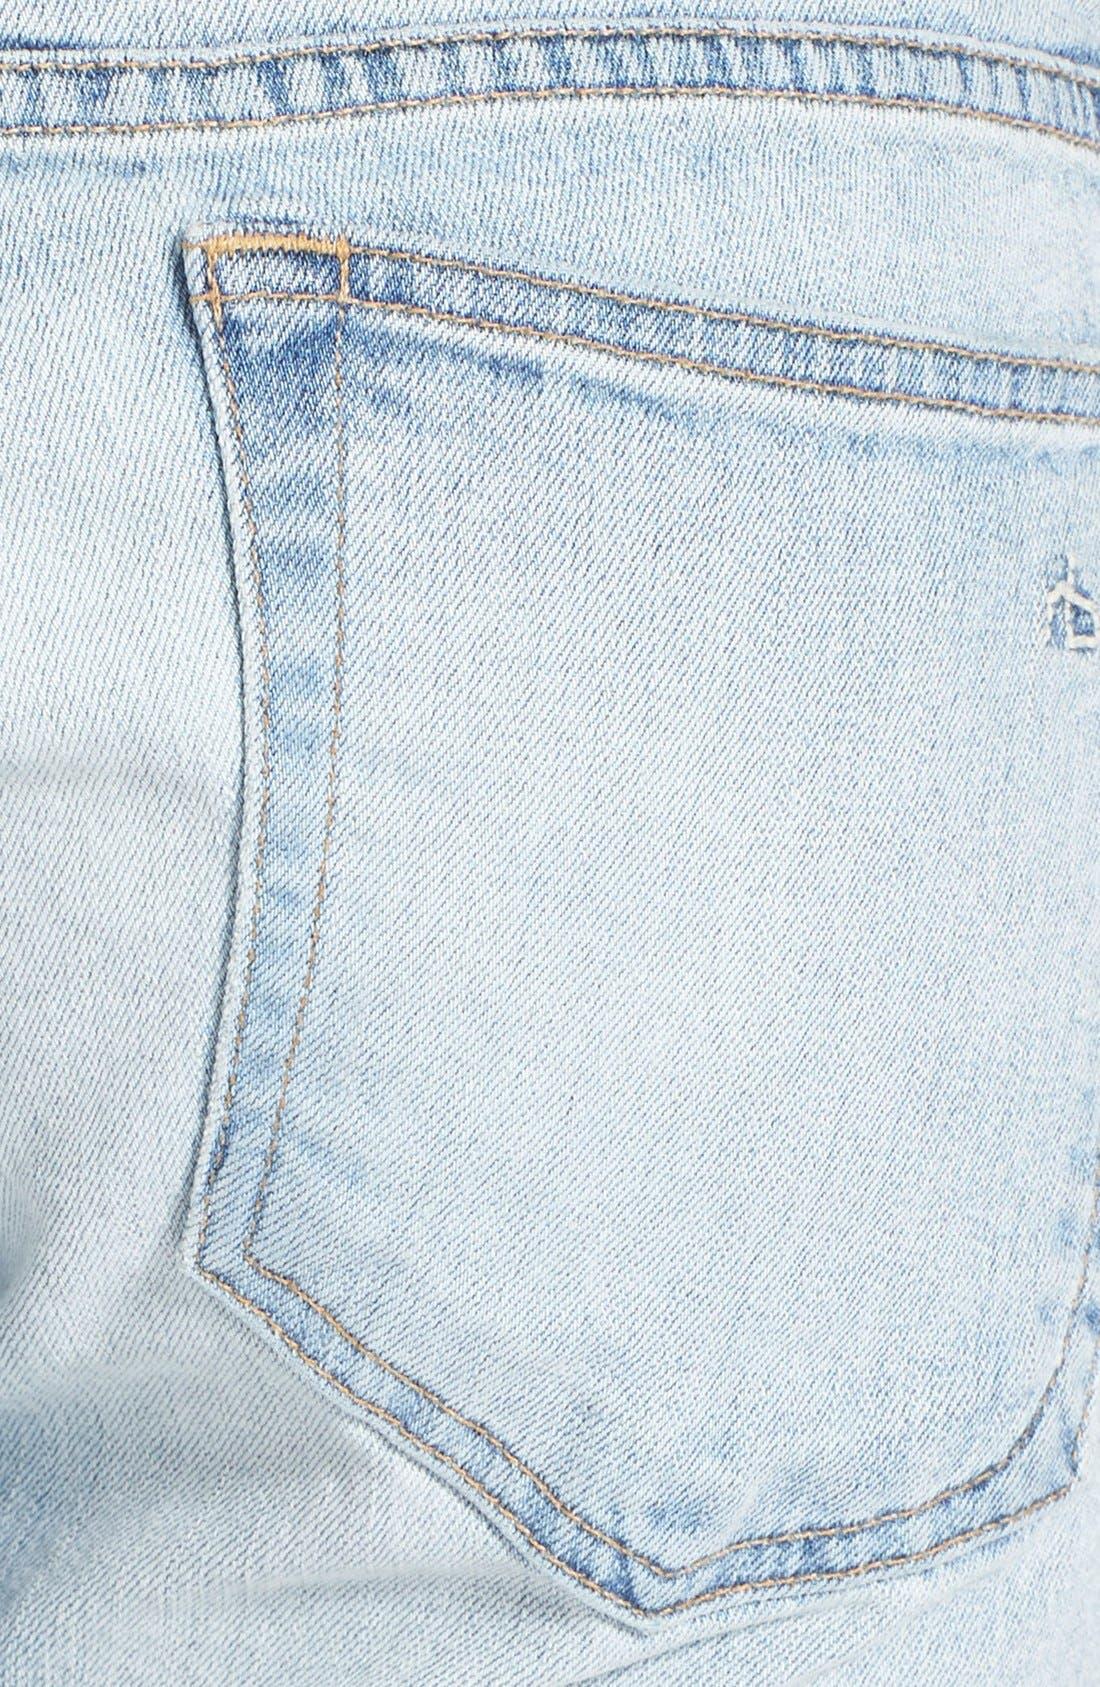 RAG & BONE,                             JEAN 'Dre' Frayed Hem Ankle Jeans,                             Alternate thumbnail 2, color,                             456